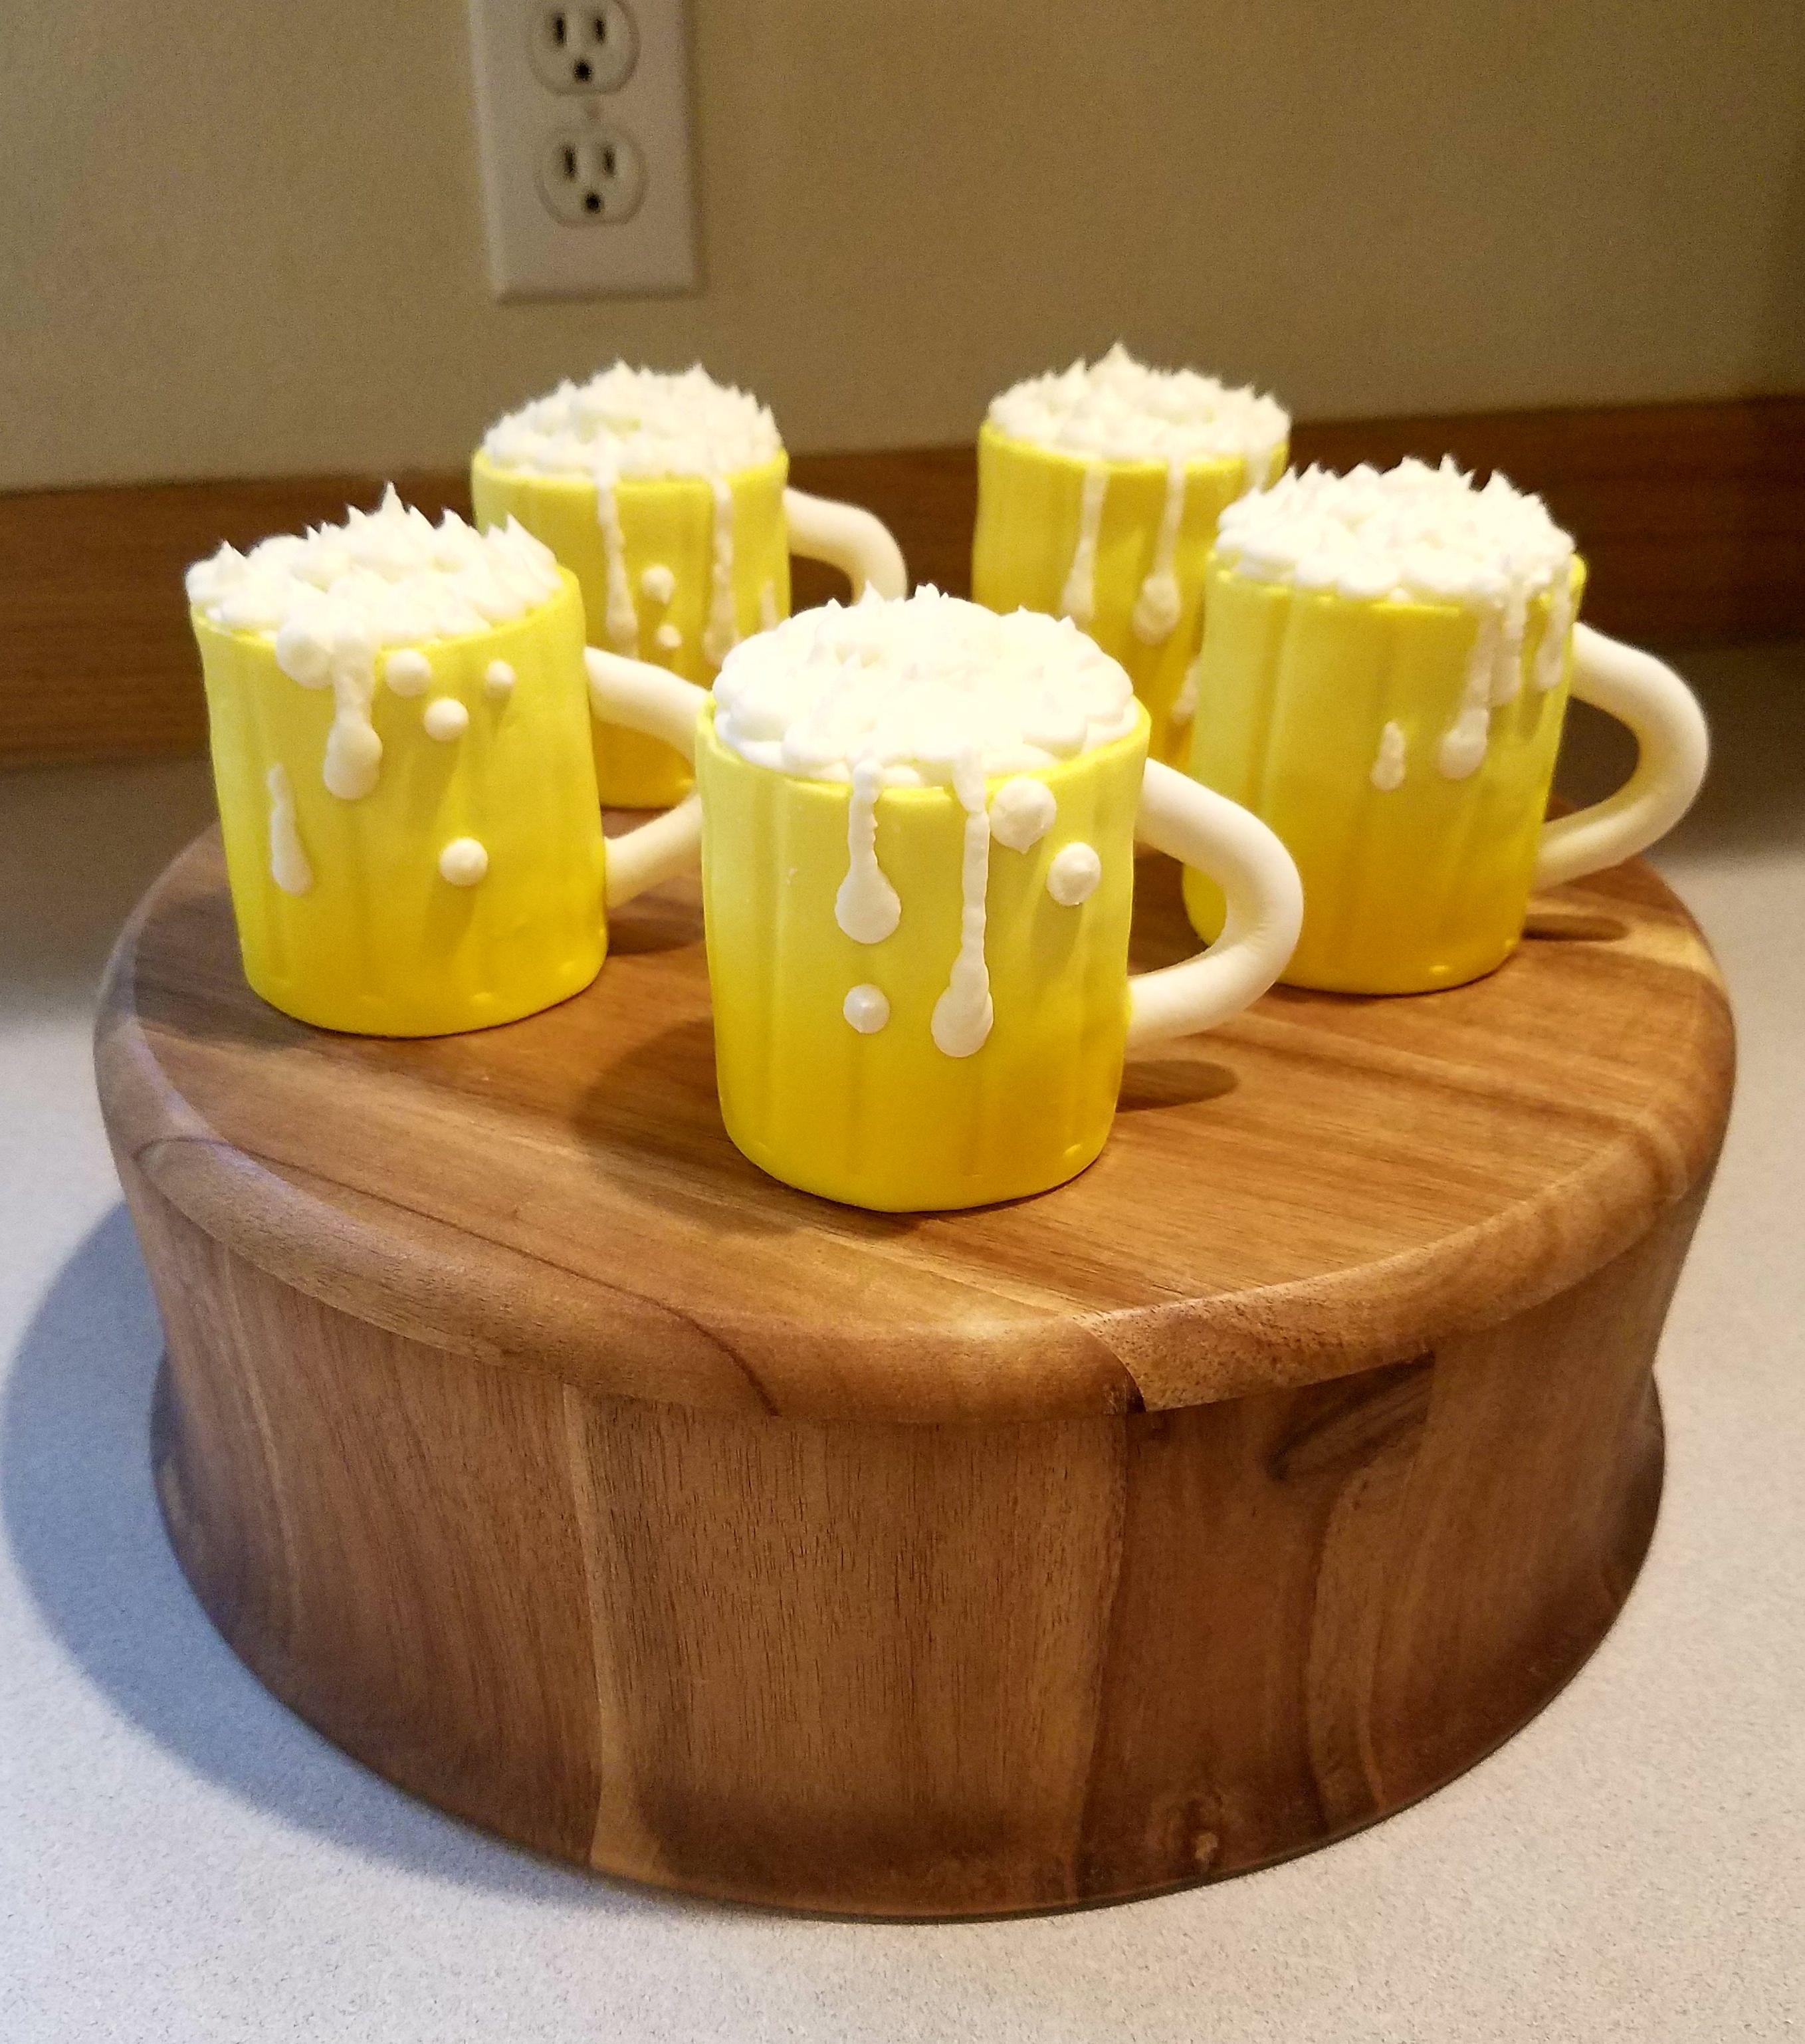 Beer mug cupcakes